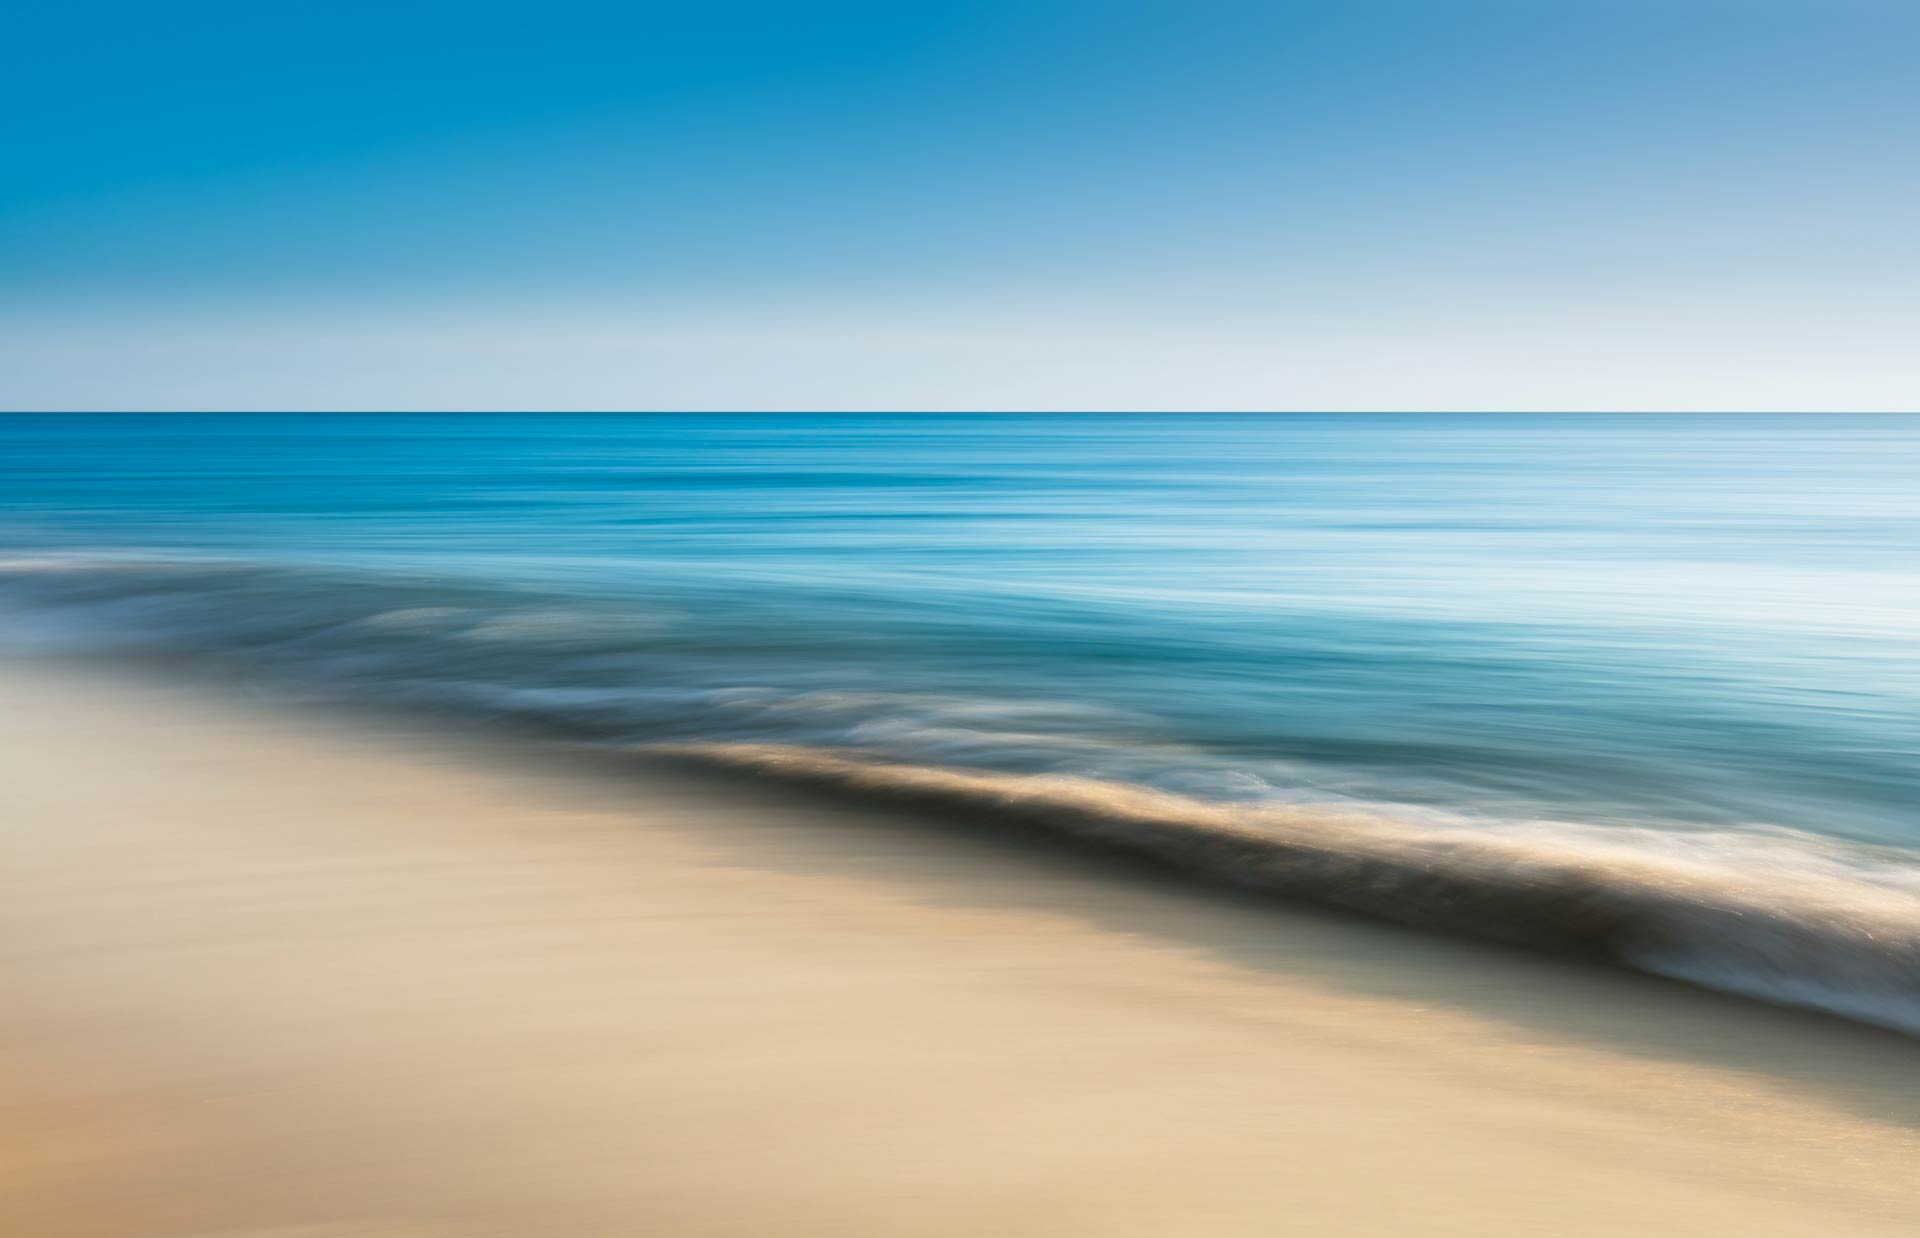 Florida Ocean art